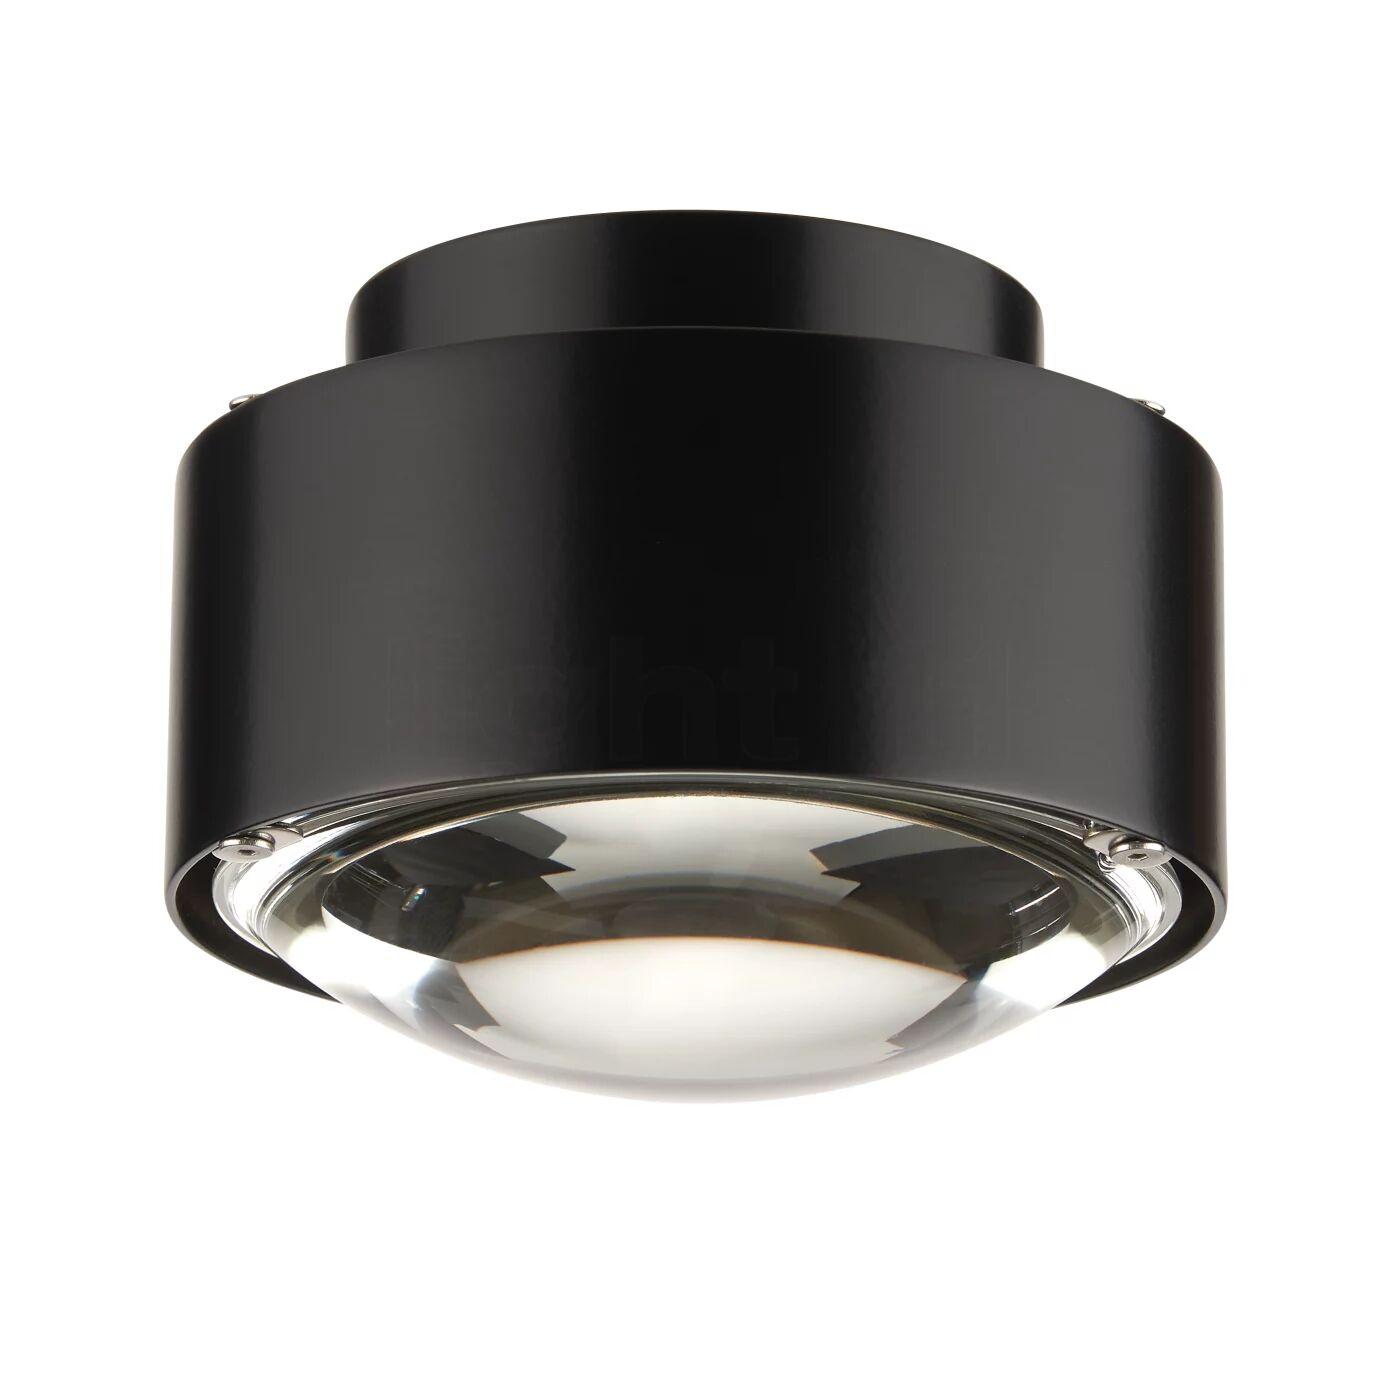 Top Light Puk Maxx Outdoor Plus LED,